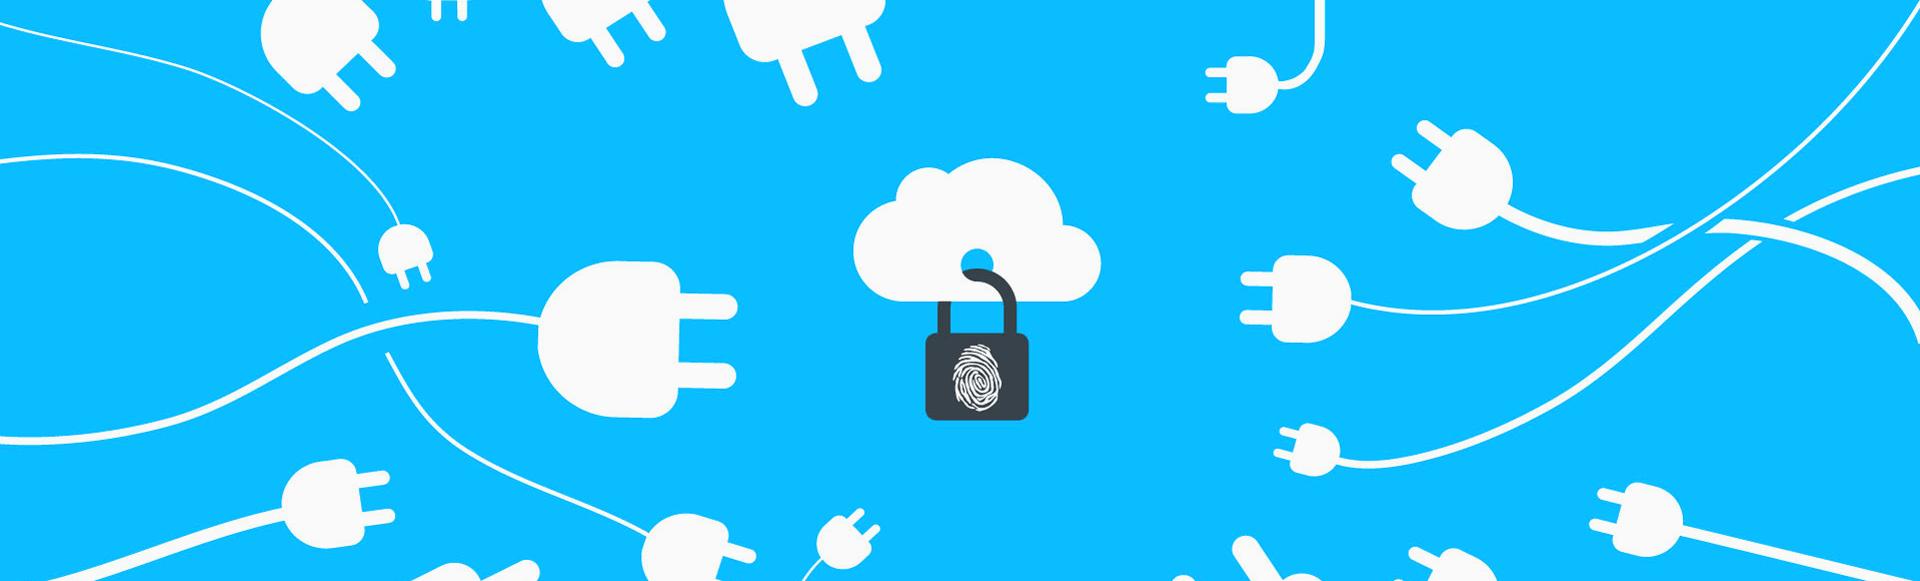 Data integrity through ThreatModeling